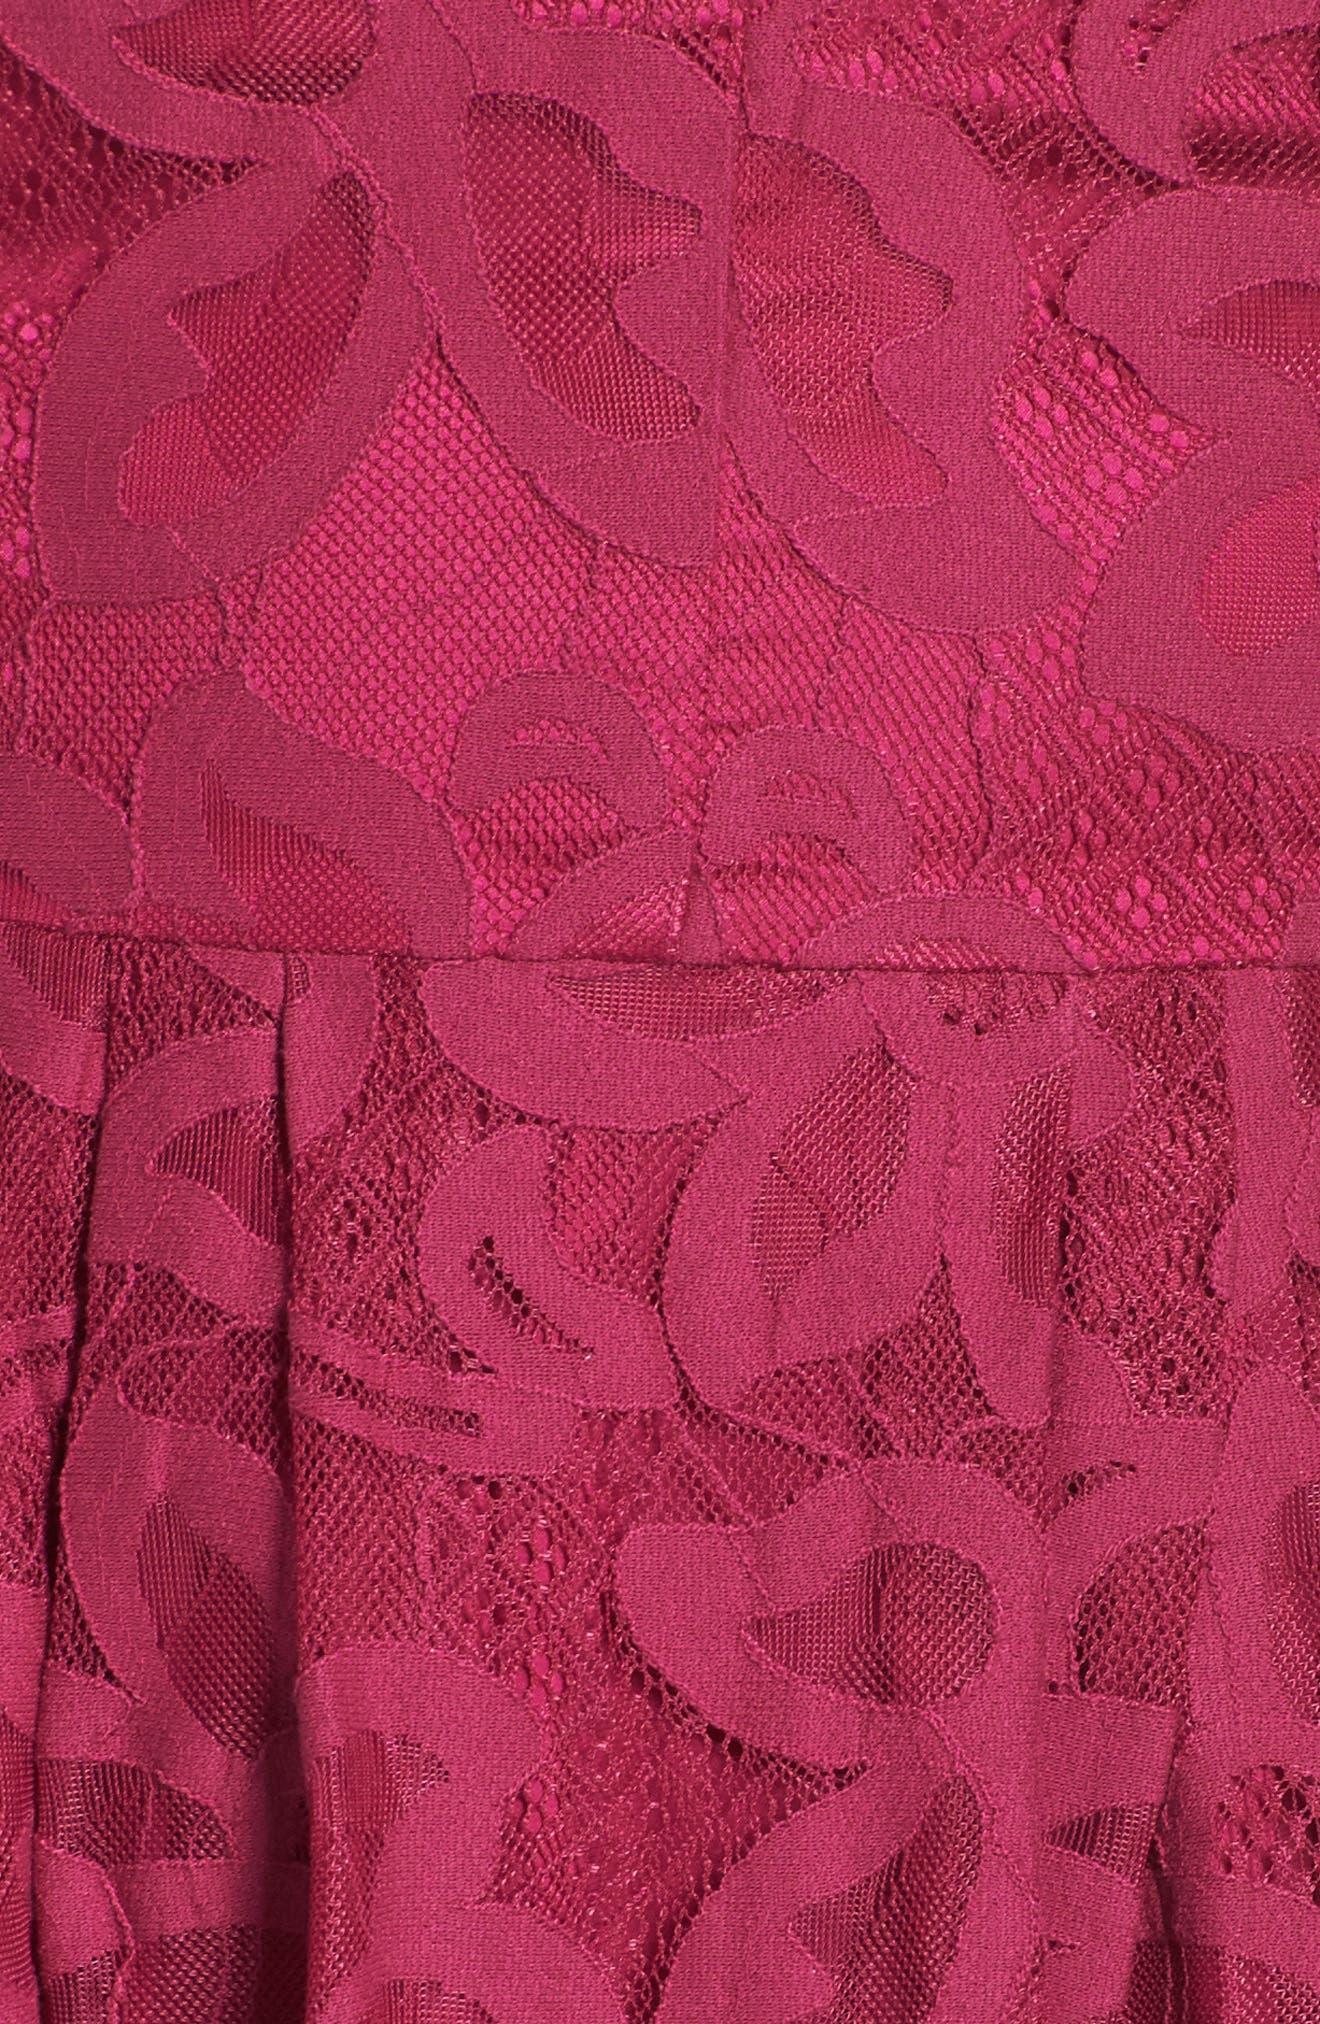 Celeste Scalloped Lace Fit & Flare Dress,                             Alternate thumbnail 5, color,